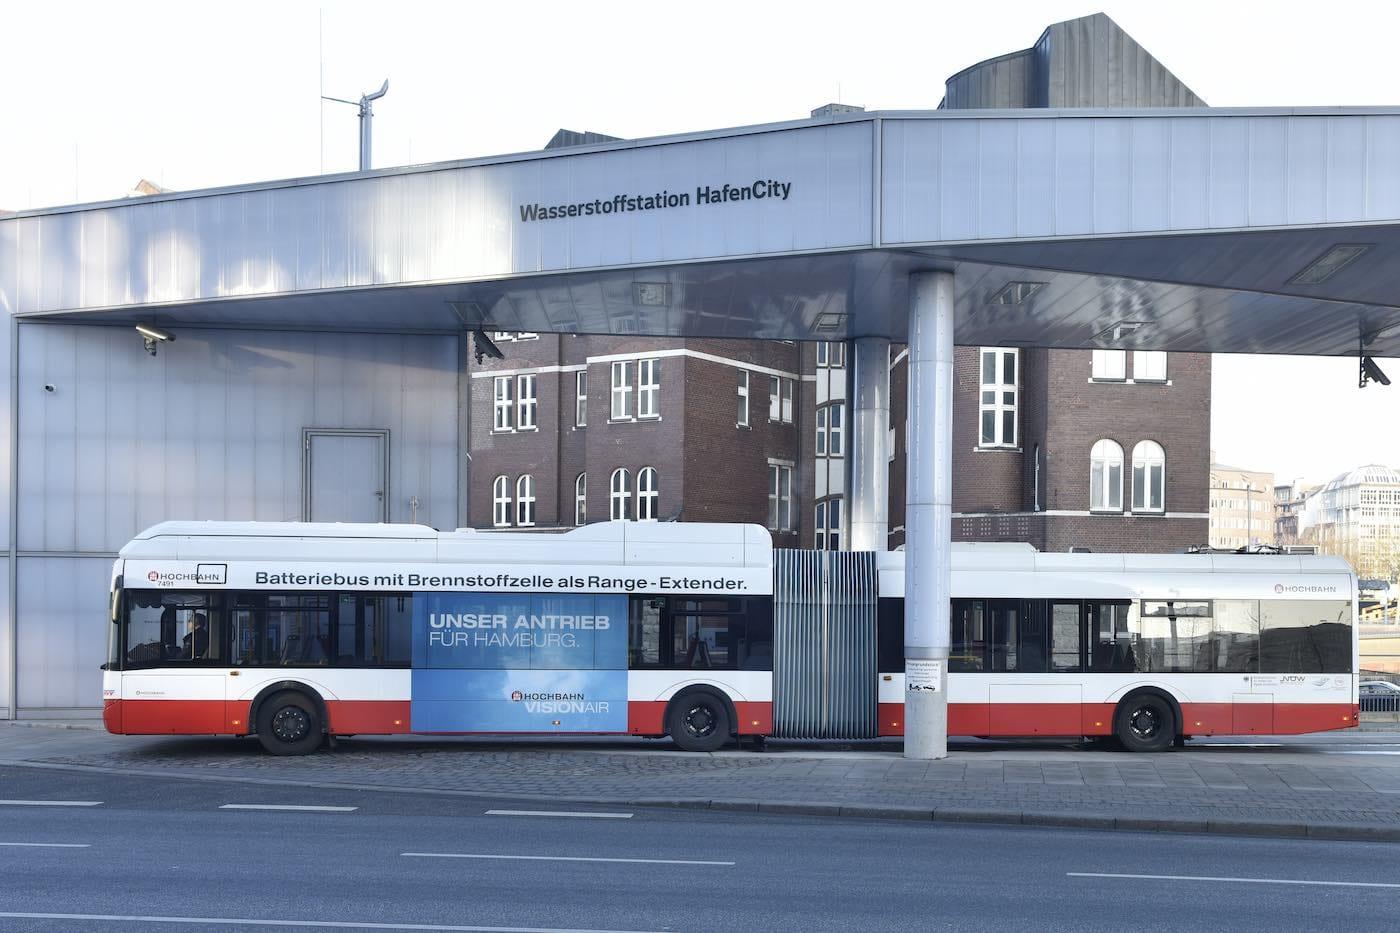 autobus idrogeno amburgo